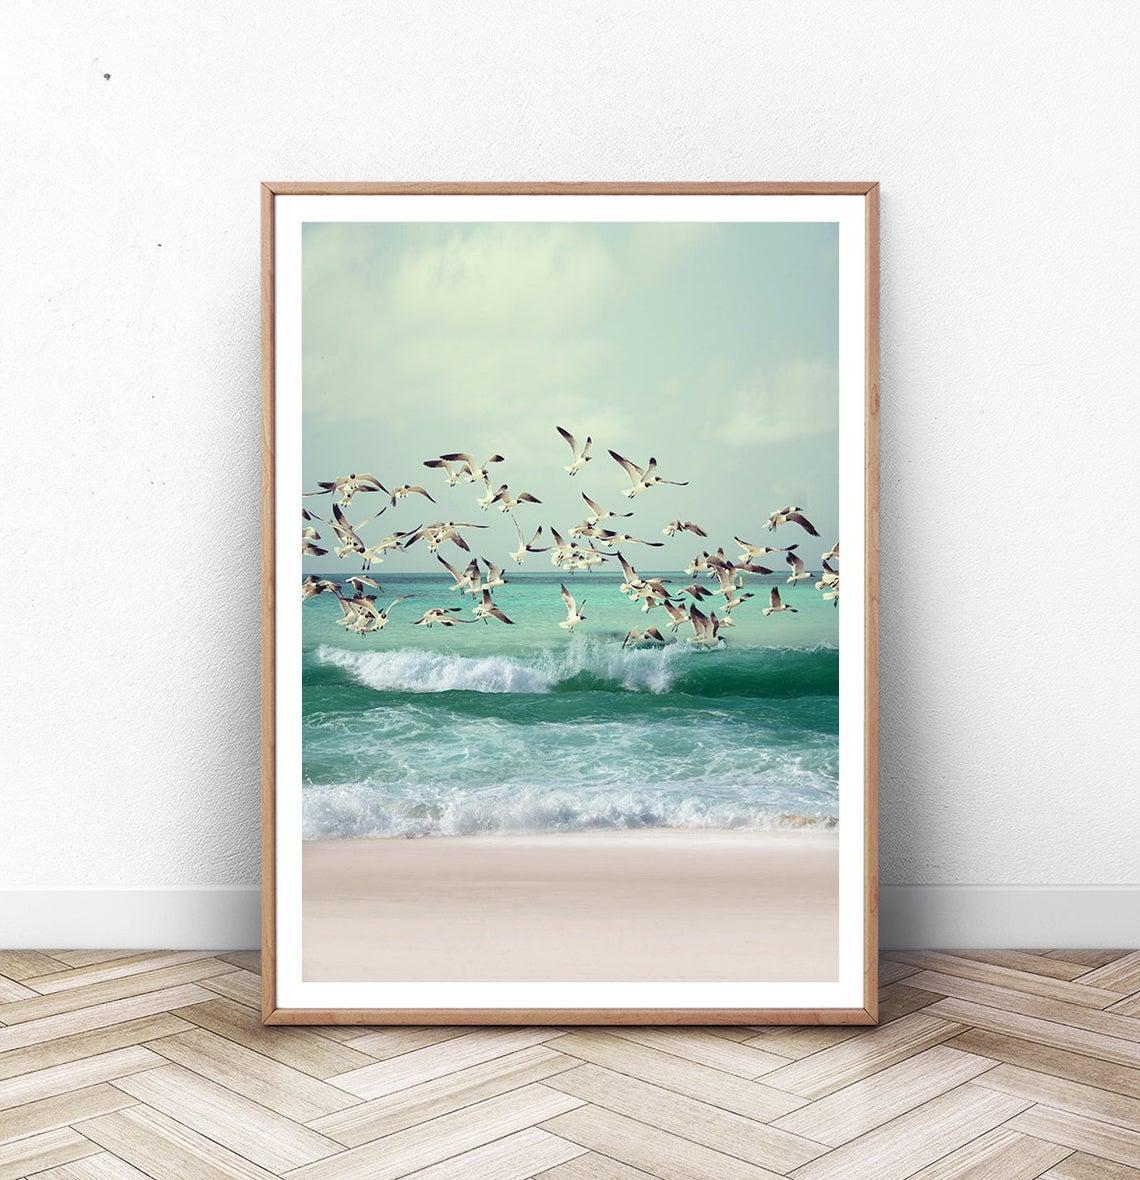 Постер на стену Beach Seagulls Ocean формат А3